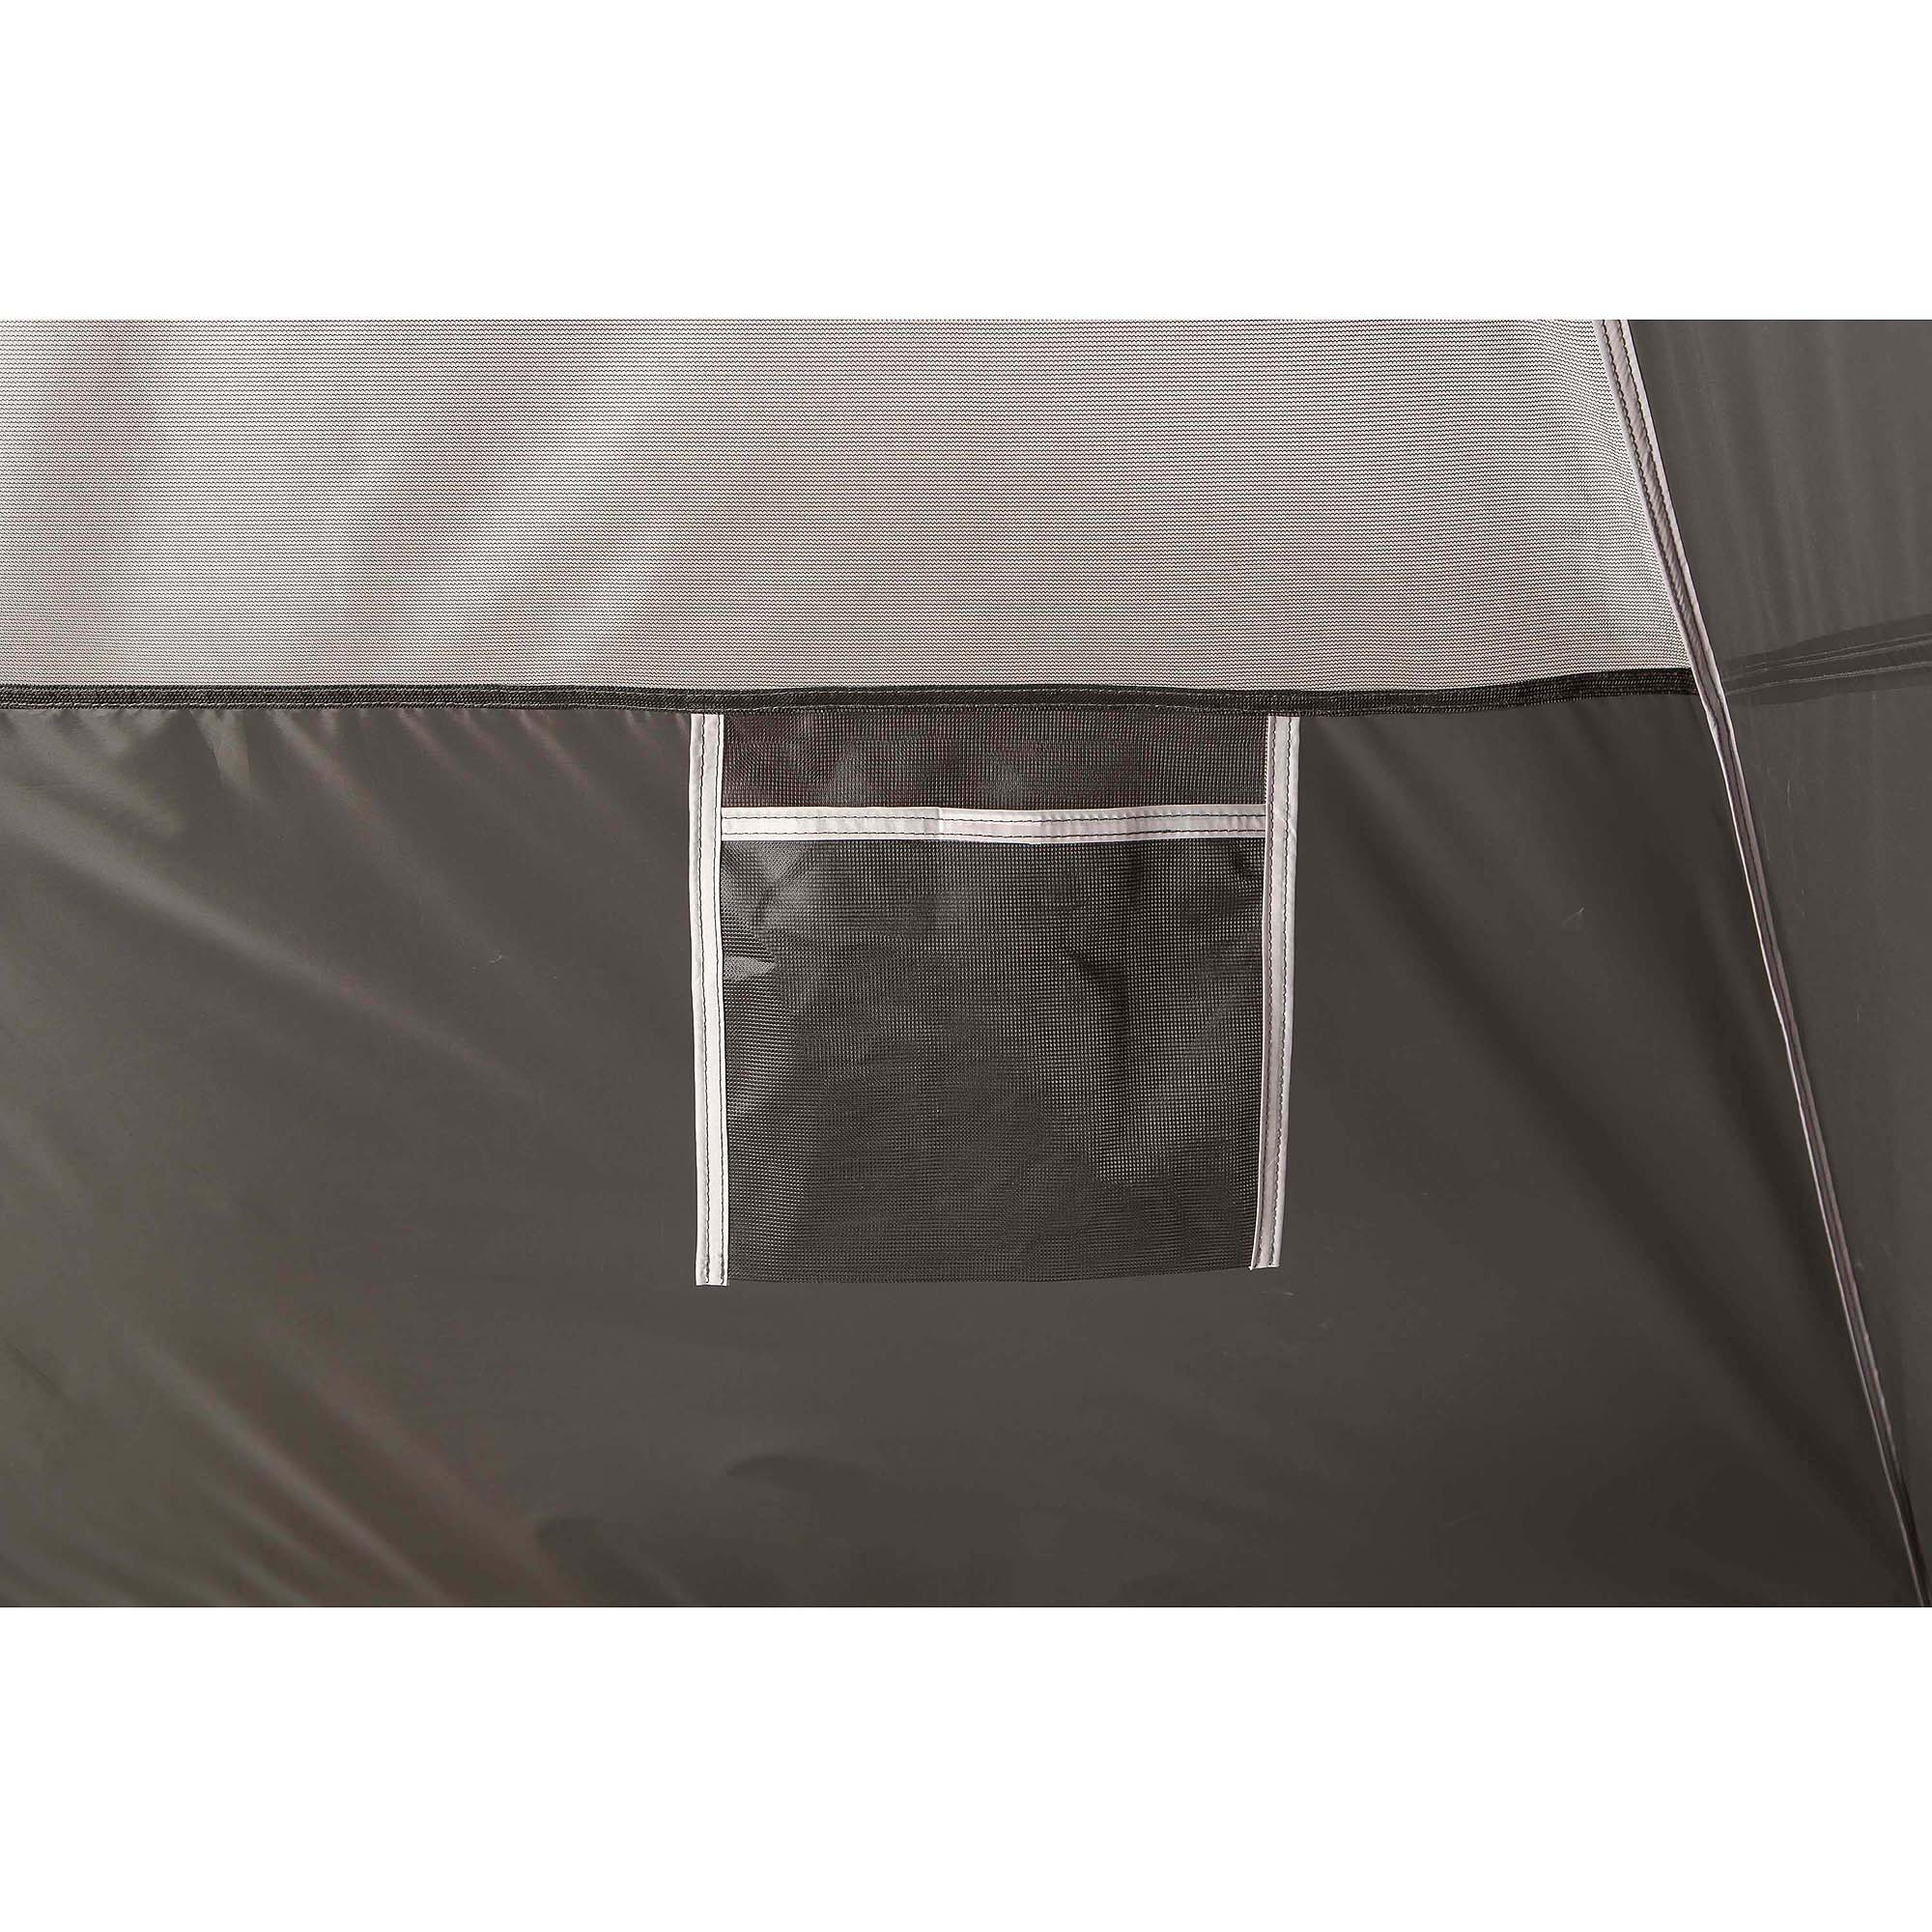 Bushnell Shield Series 8' x 7' Dome Tent, Sleeps 4